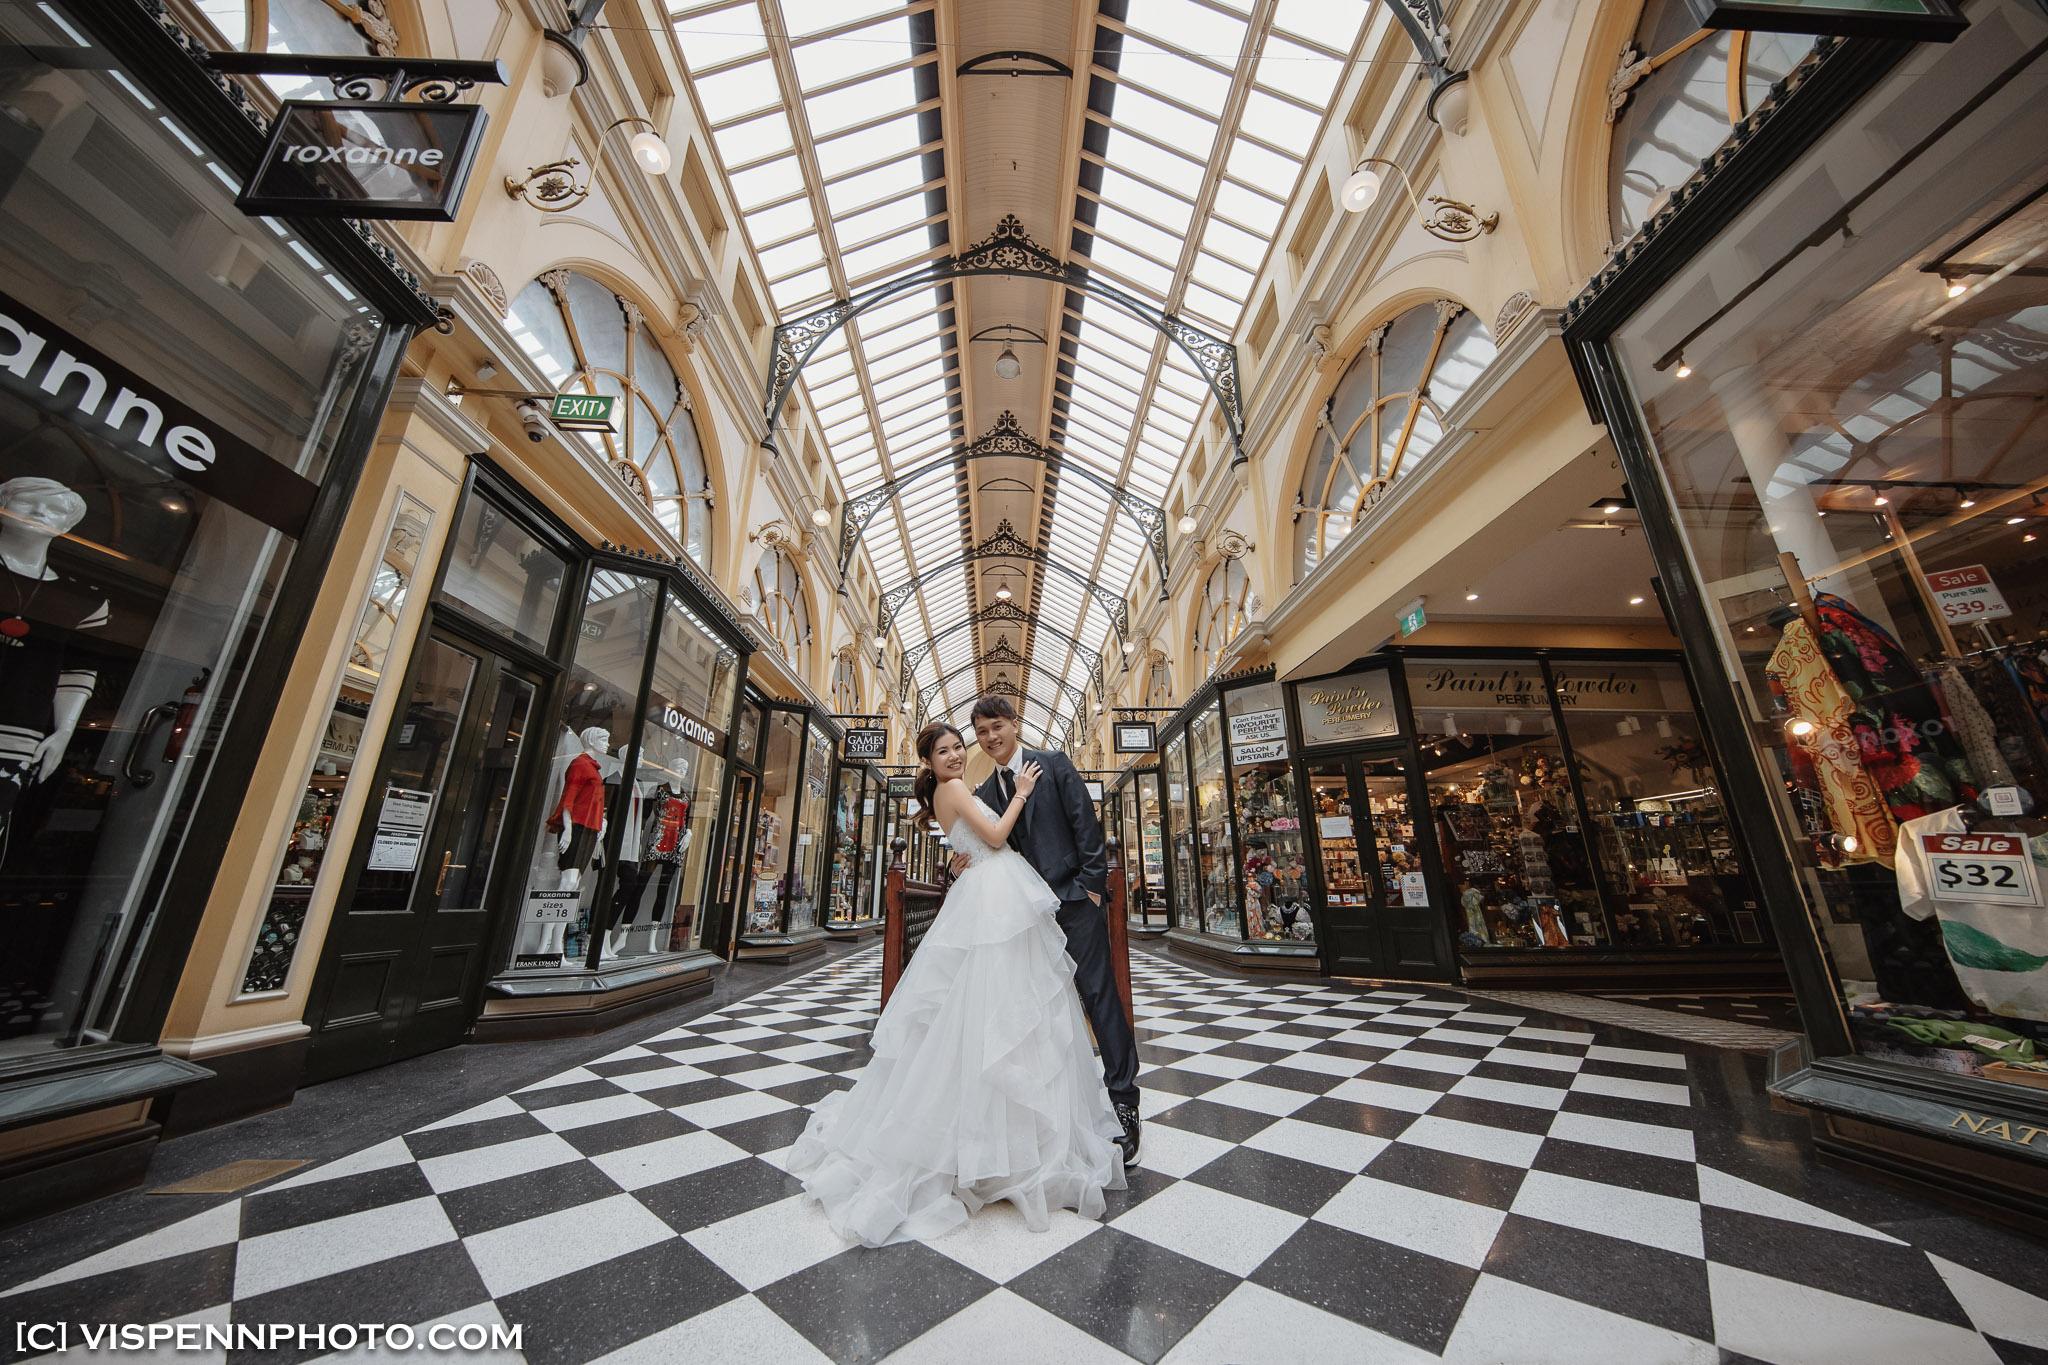 PRE WEDDING Photography Melbourne VISPENN 墨尔本 婚纱照 结婚照 婚纱摄影 GiGi 6032 EOSR VISPENN